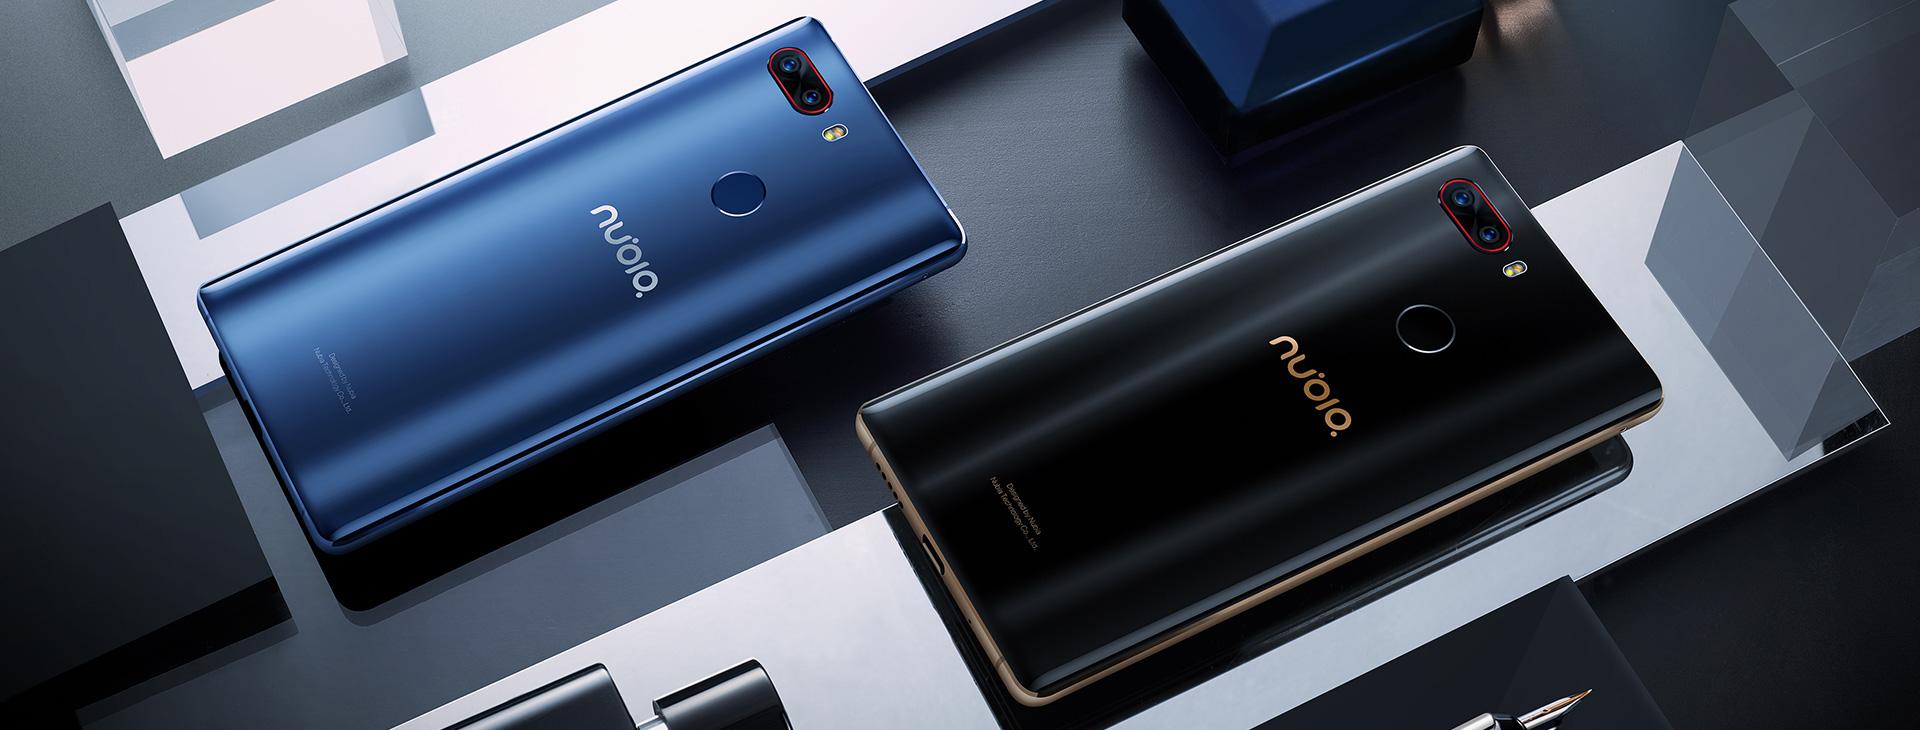 Promotion smartphone Nubia Z17S